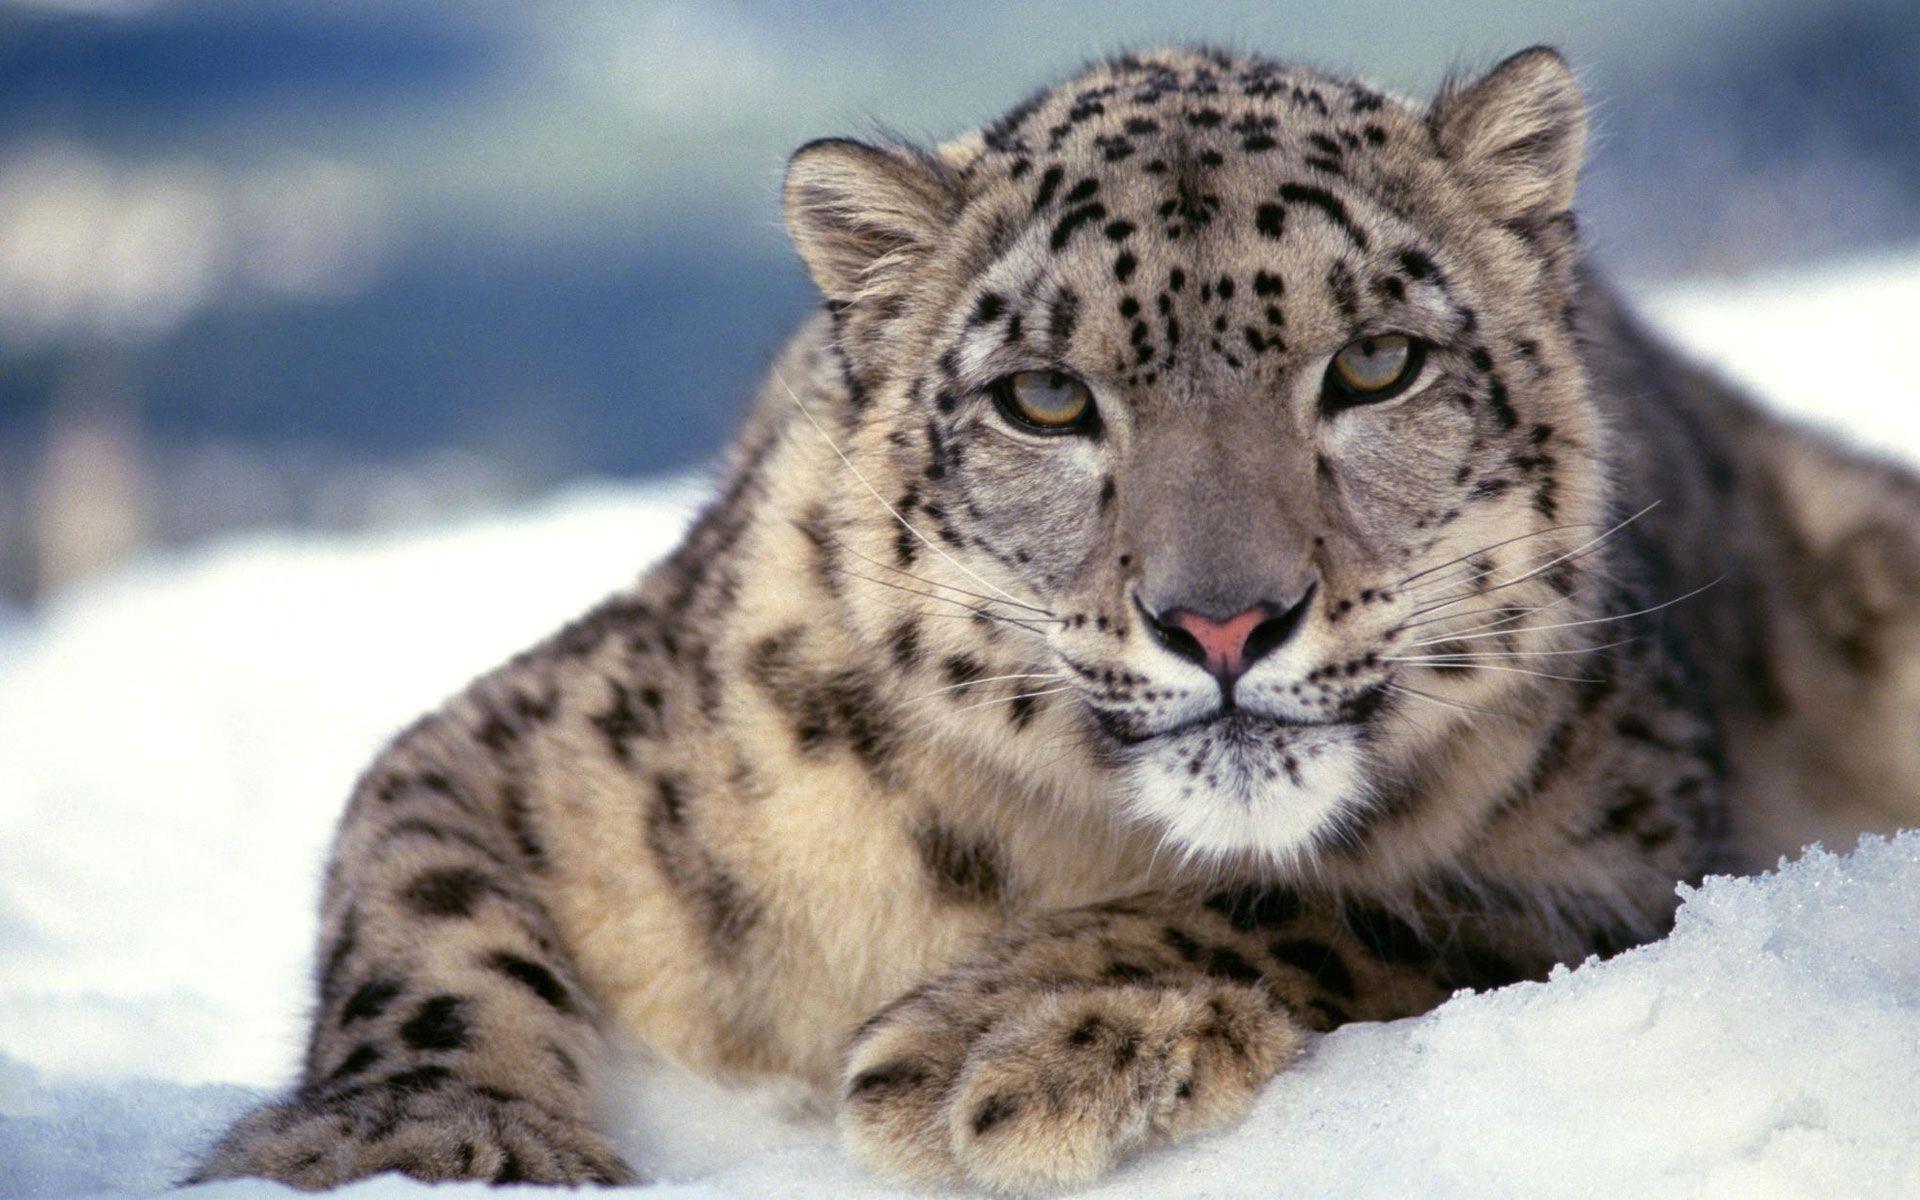 Snow leopard tiger hybrid